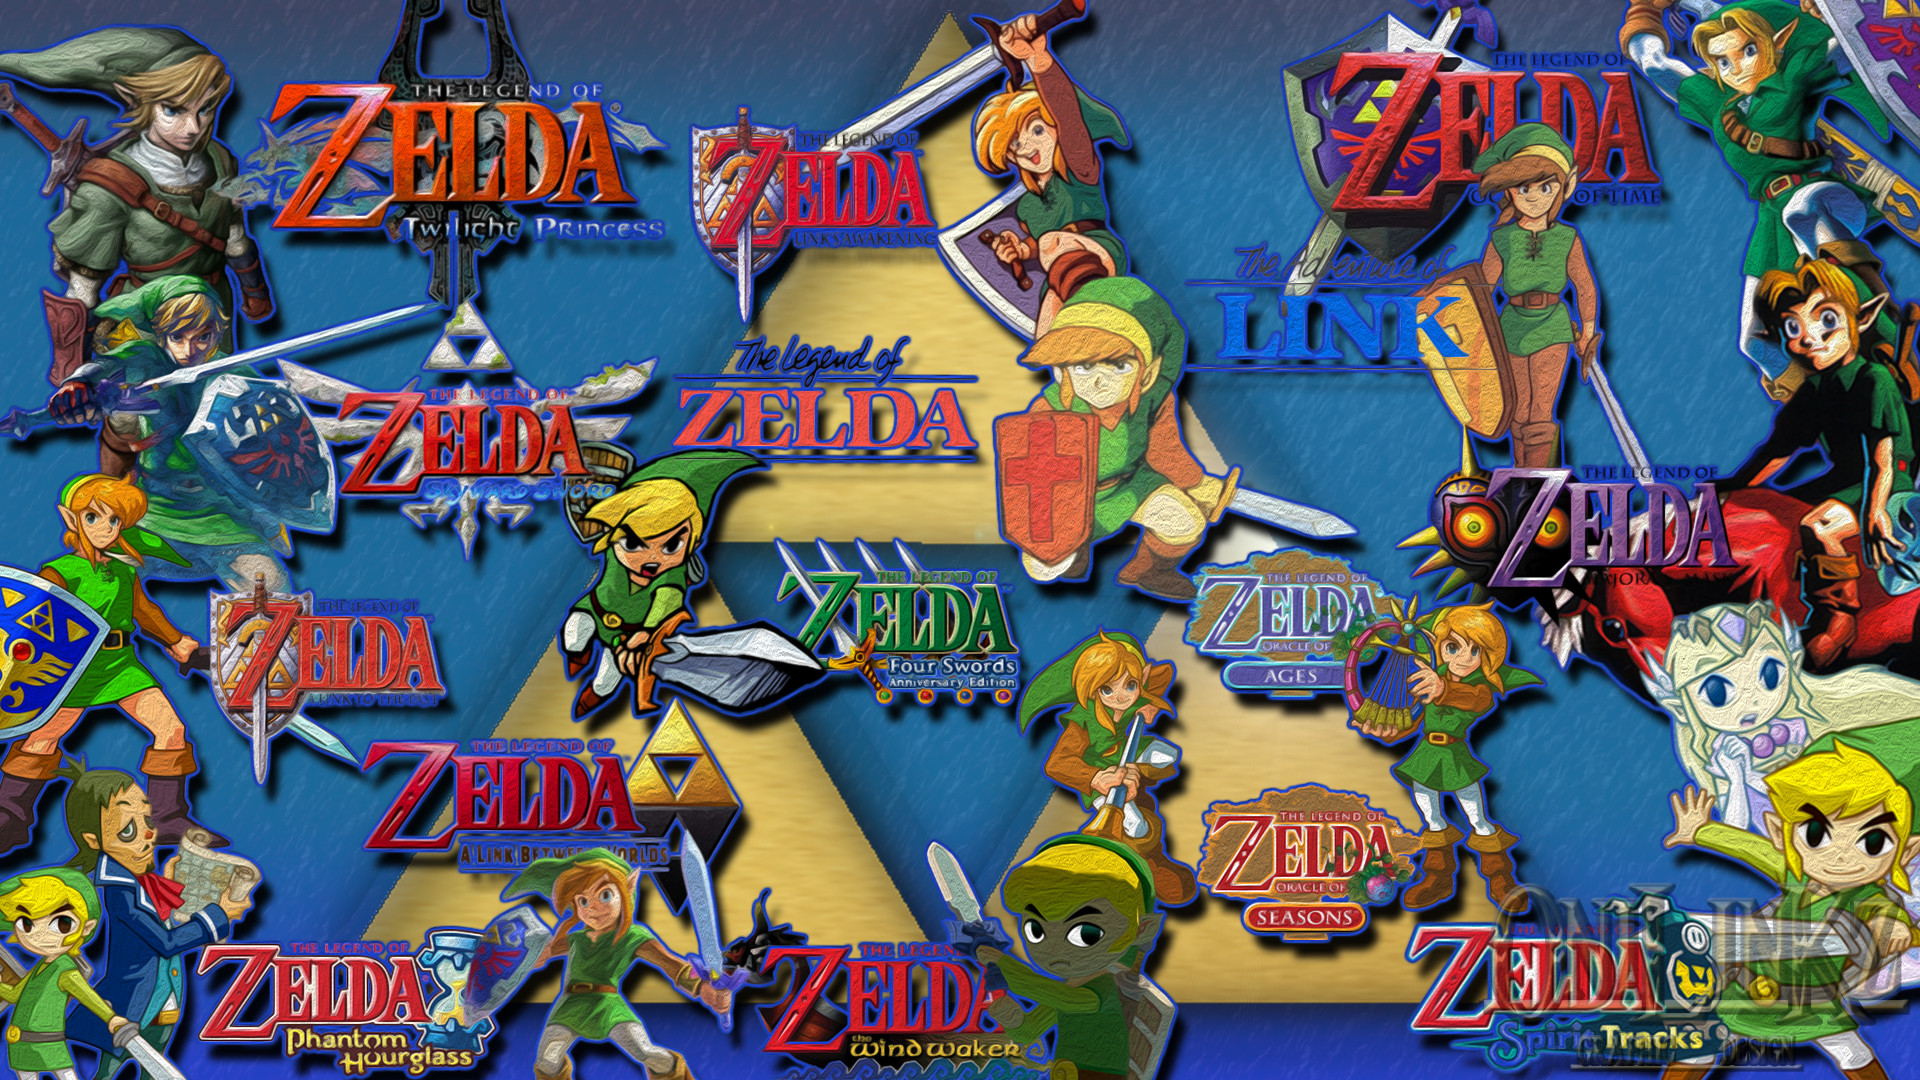 Zelda Wallpaper 1080p Link's history by 0nilinkz Zelda Wallpaper 1080p  Link's history by 0nilinkz